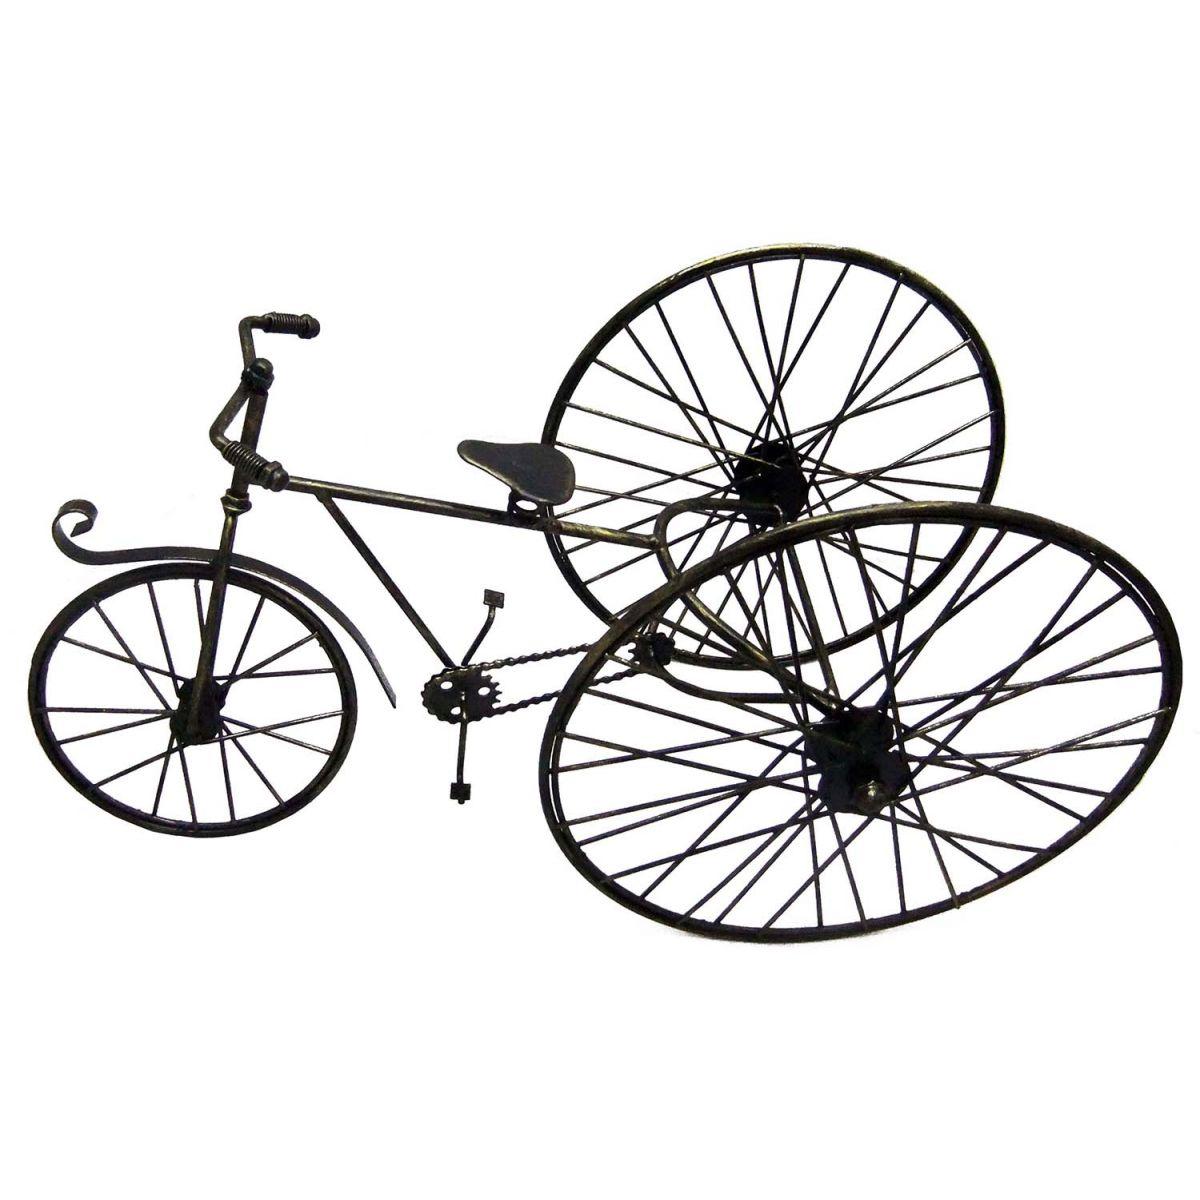 Triciclo Bicicleta Retro Vintage Metal Mesa Miniatura (REL-33)